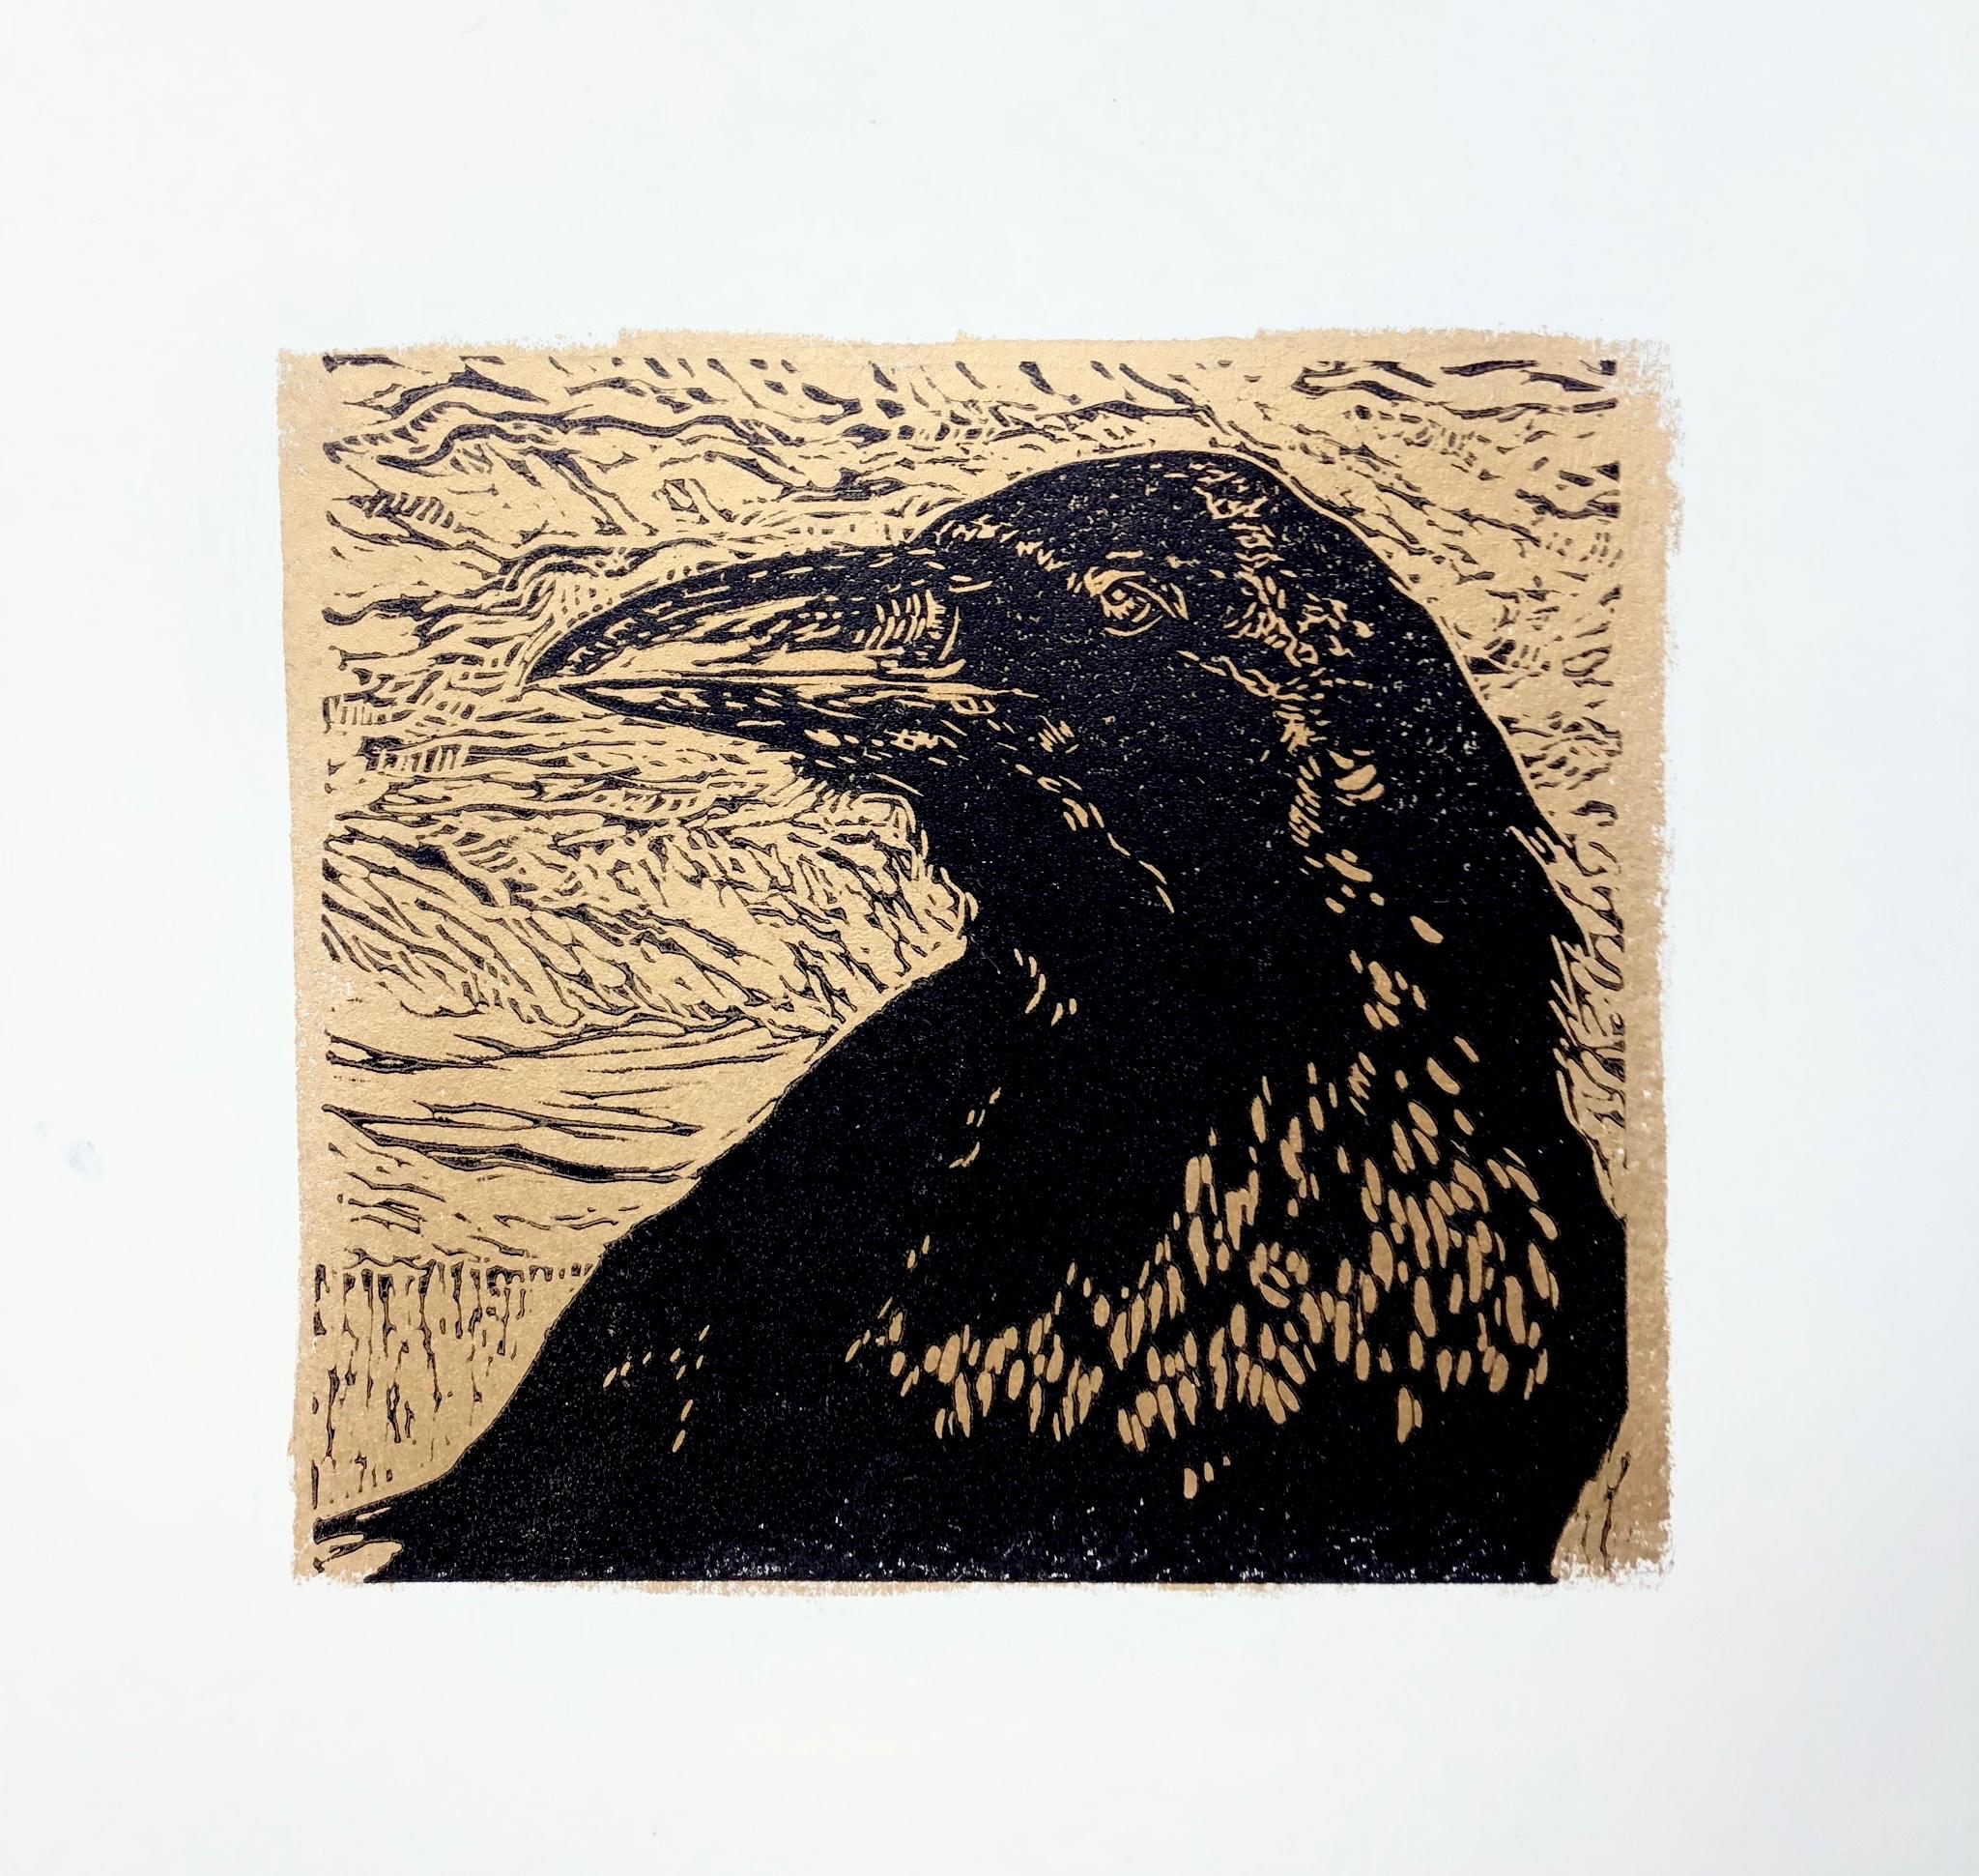 Portrait of Raven in Gold - Zion National Park - woodcut print